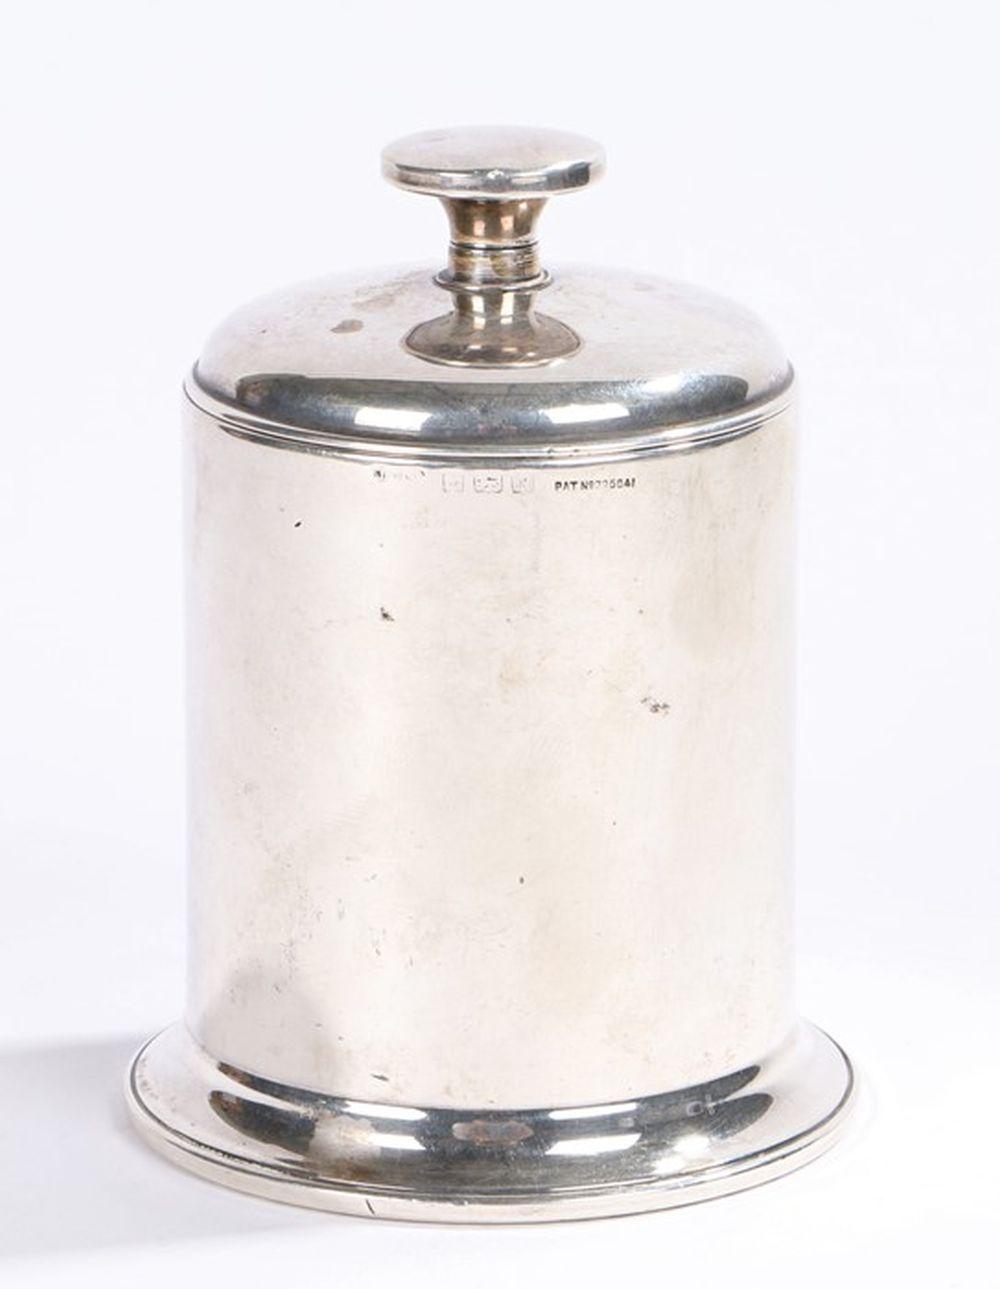 George VI silver cigarette dispenser, Birmingham 1937, maker Joseph Gloster Ltd, of cylindrical form